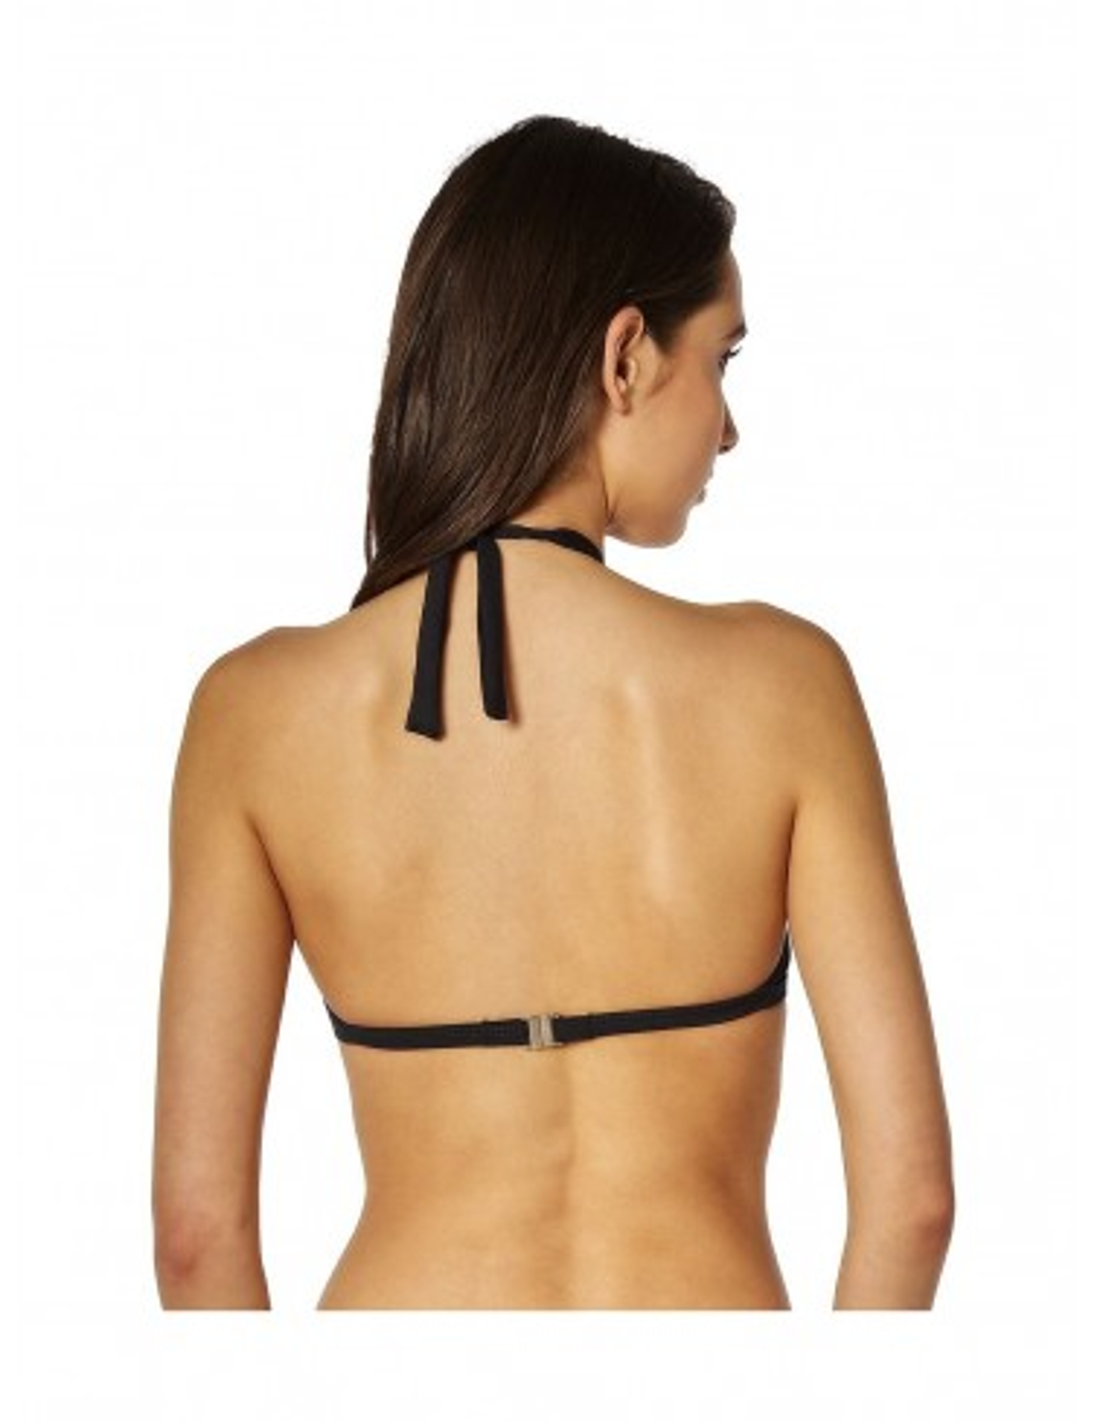 Top bikini sin aro Lili Red Point COLOR: negro; TALLAS: 40, 42  - BAÑO  - PEPI GUERRA